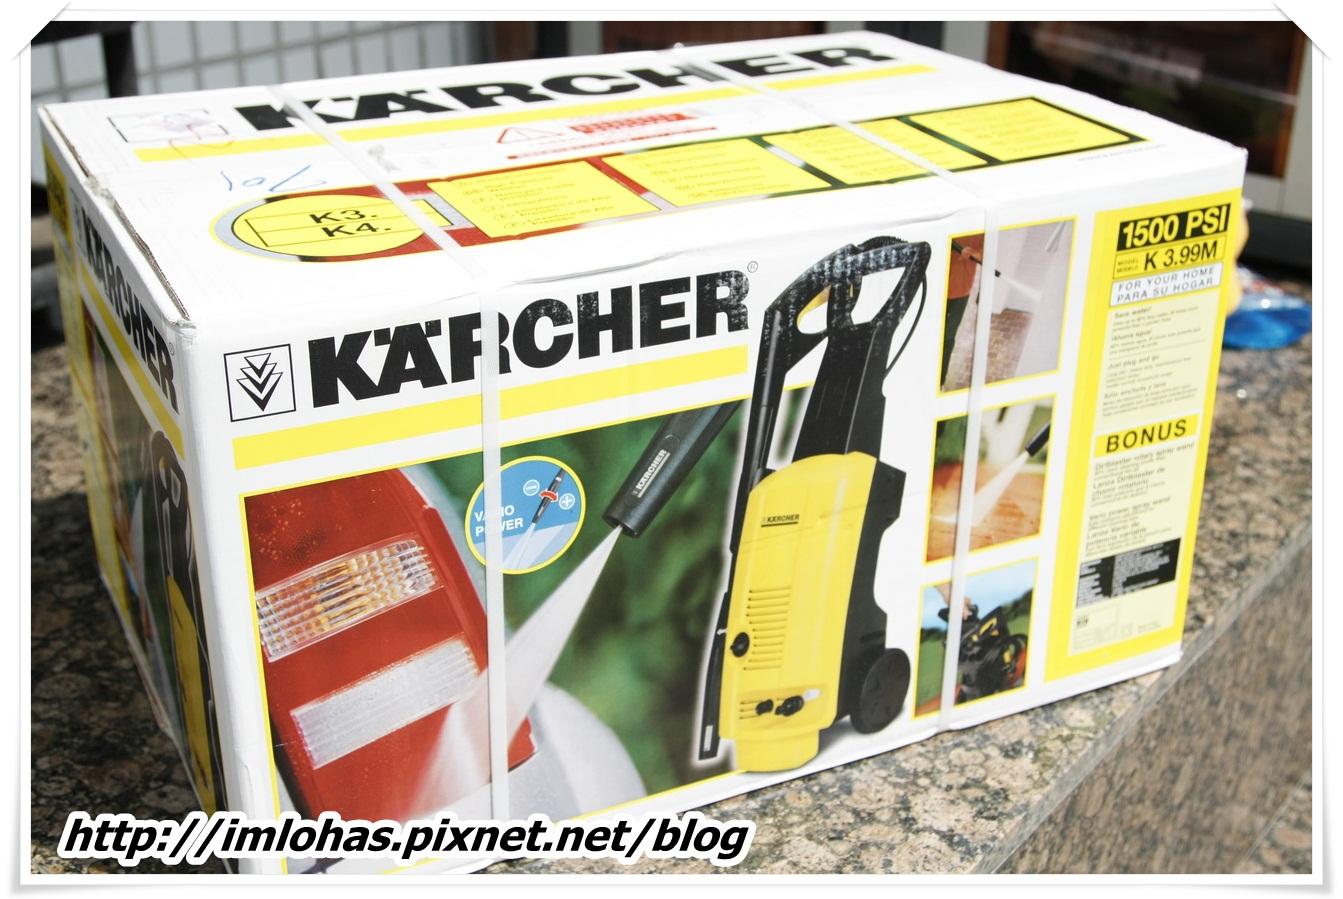 Karcher高壓清洗機開箱文15.JPG